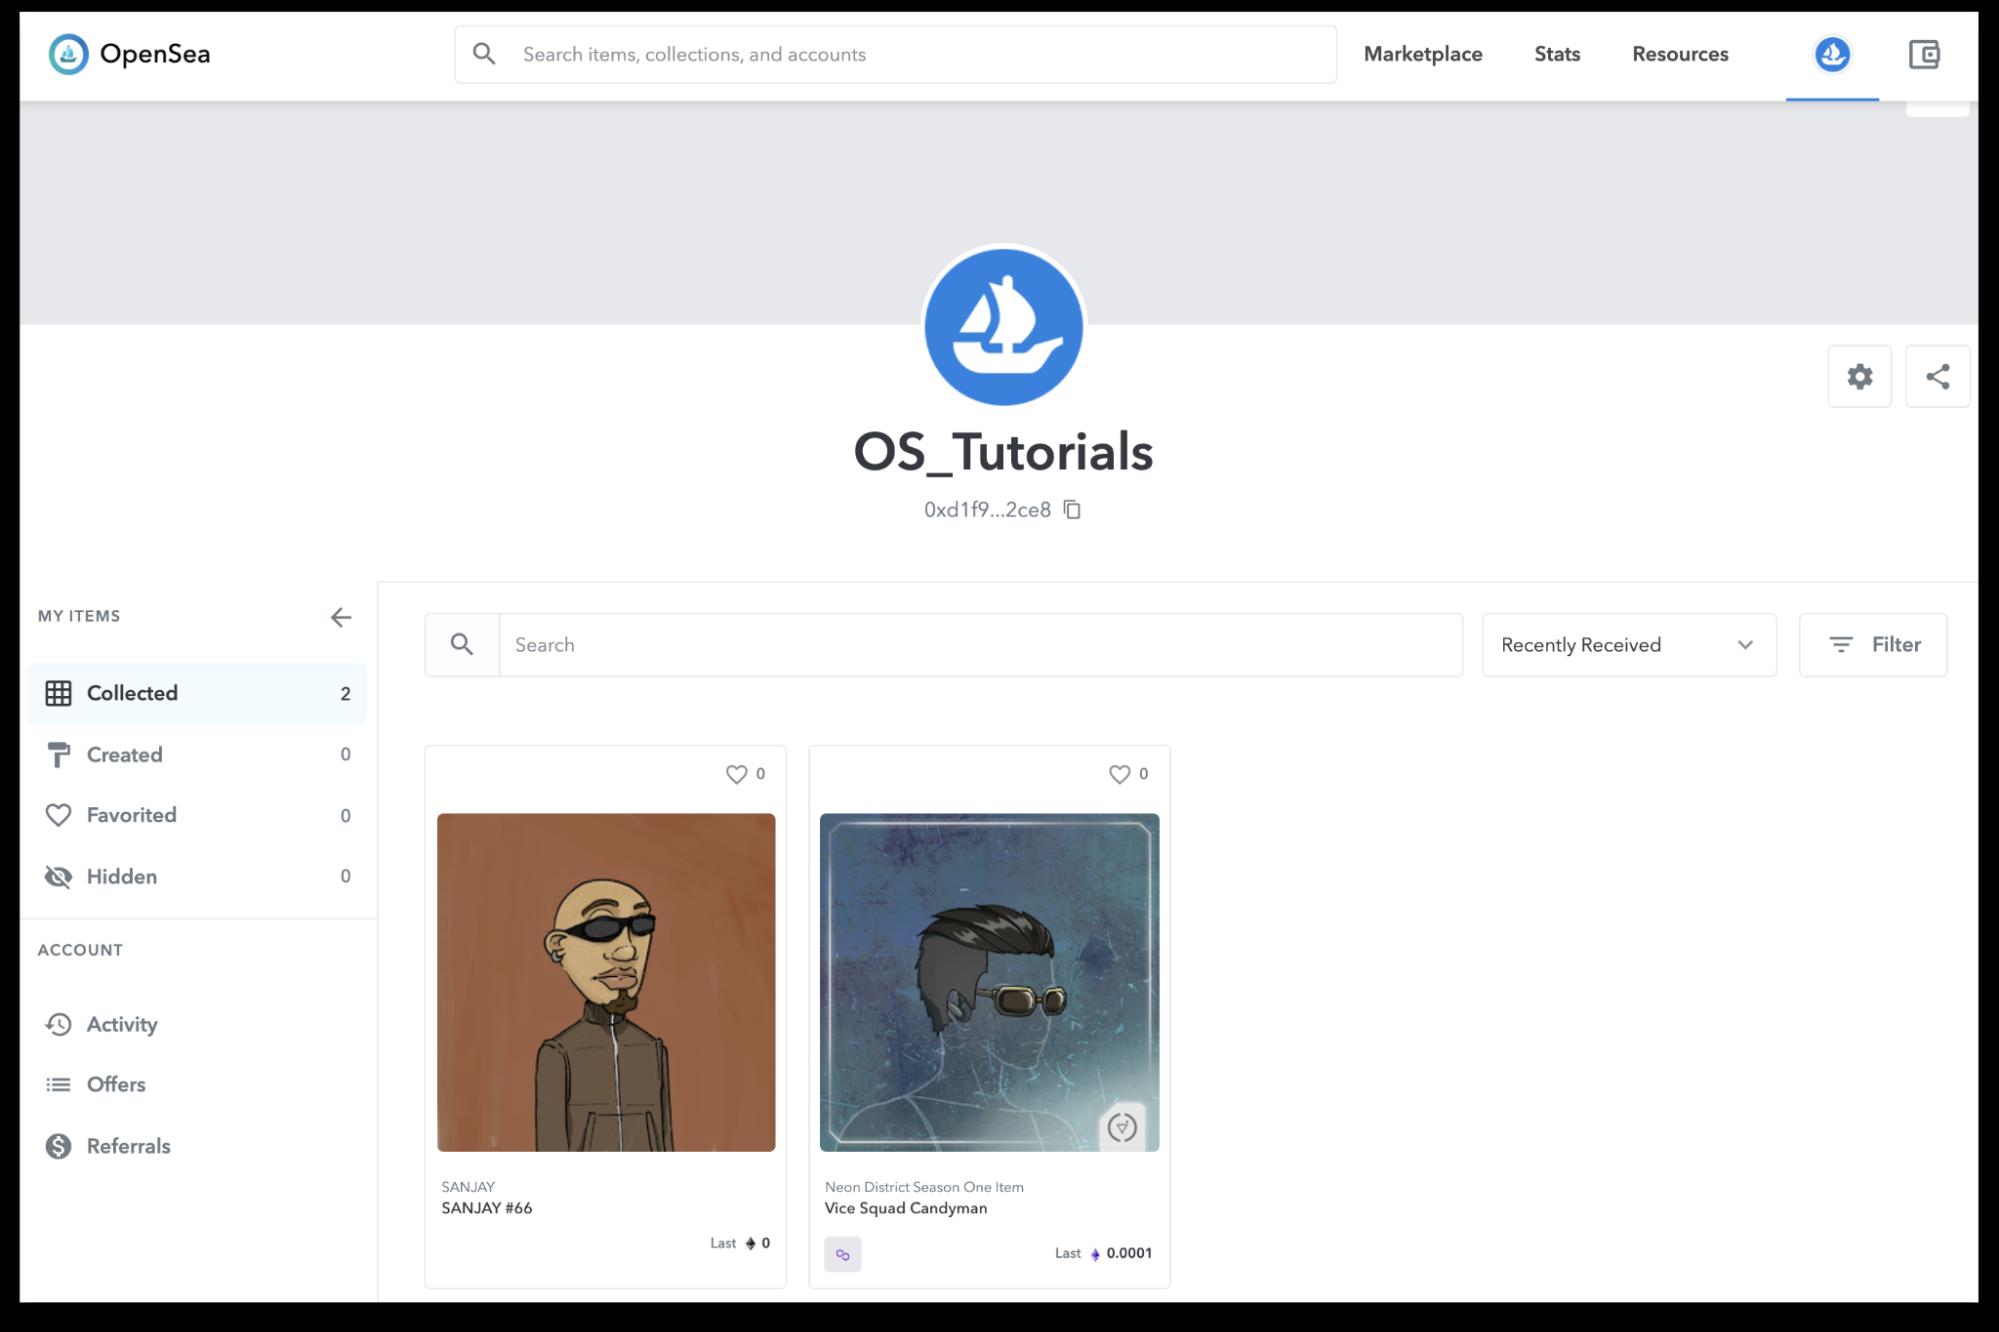 The UI of My items tab on OpenSea website